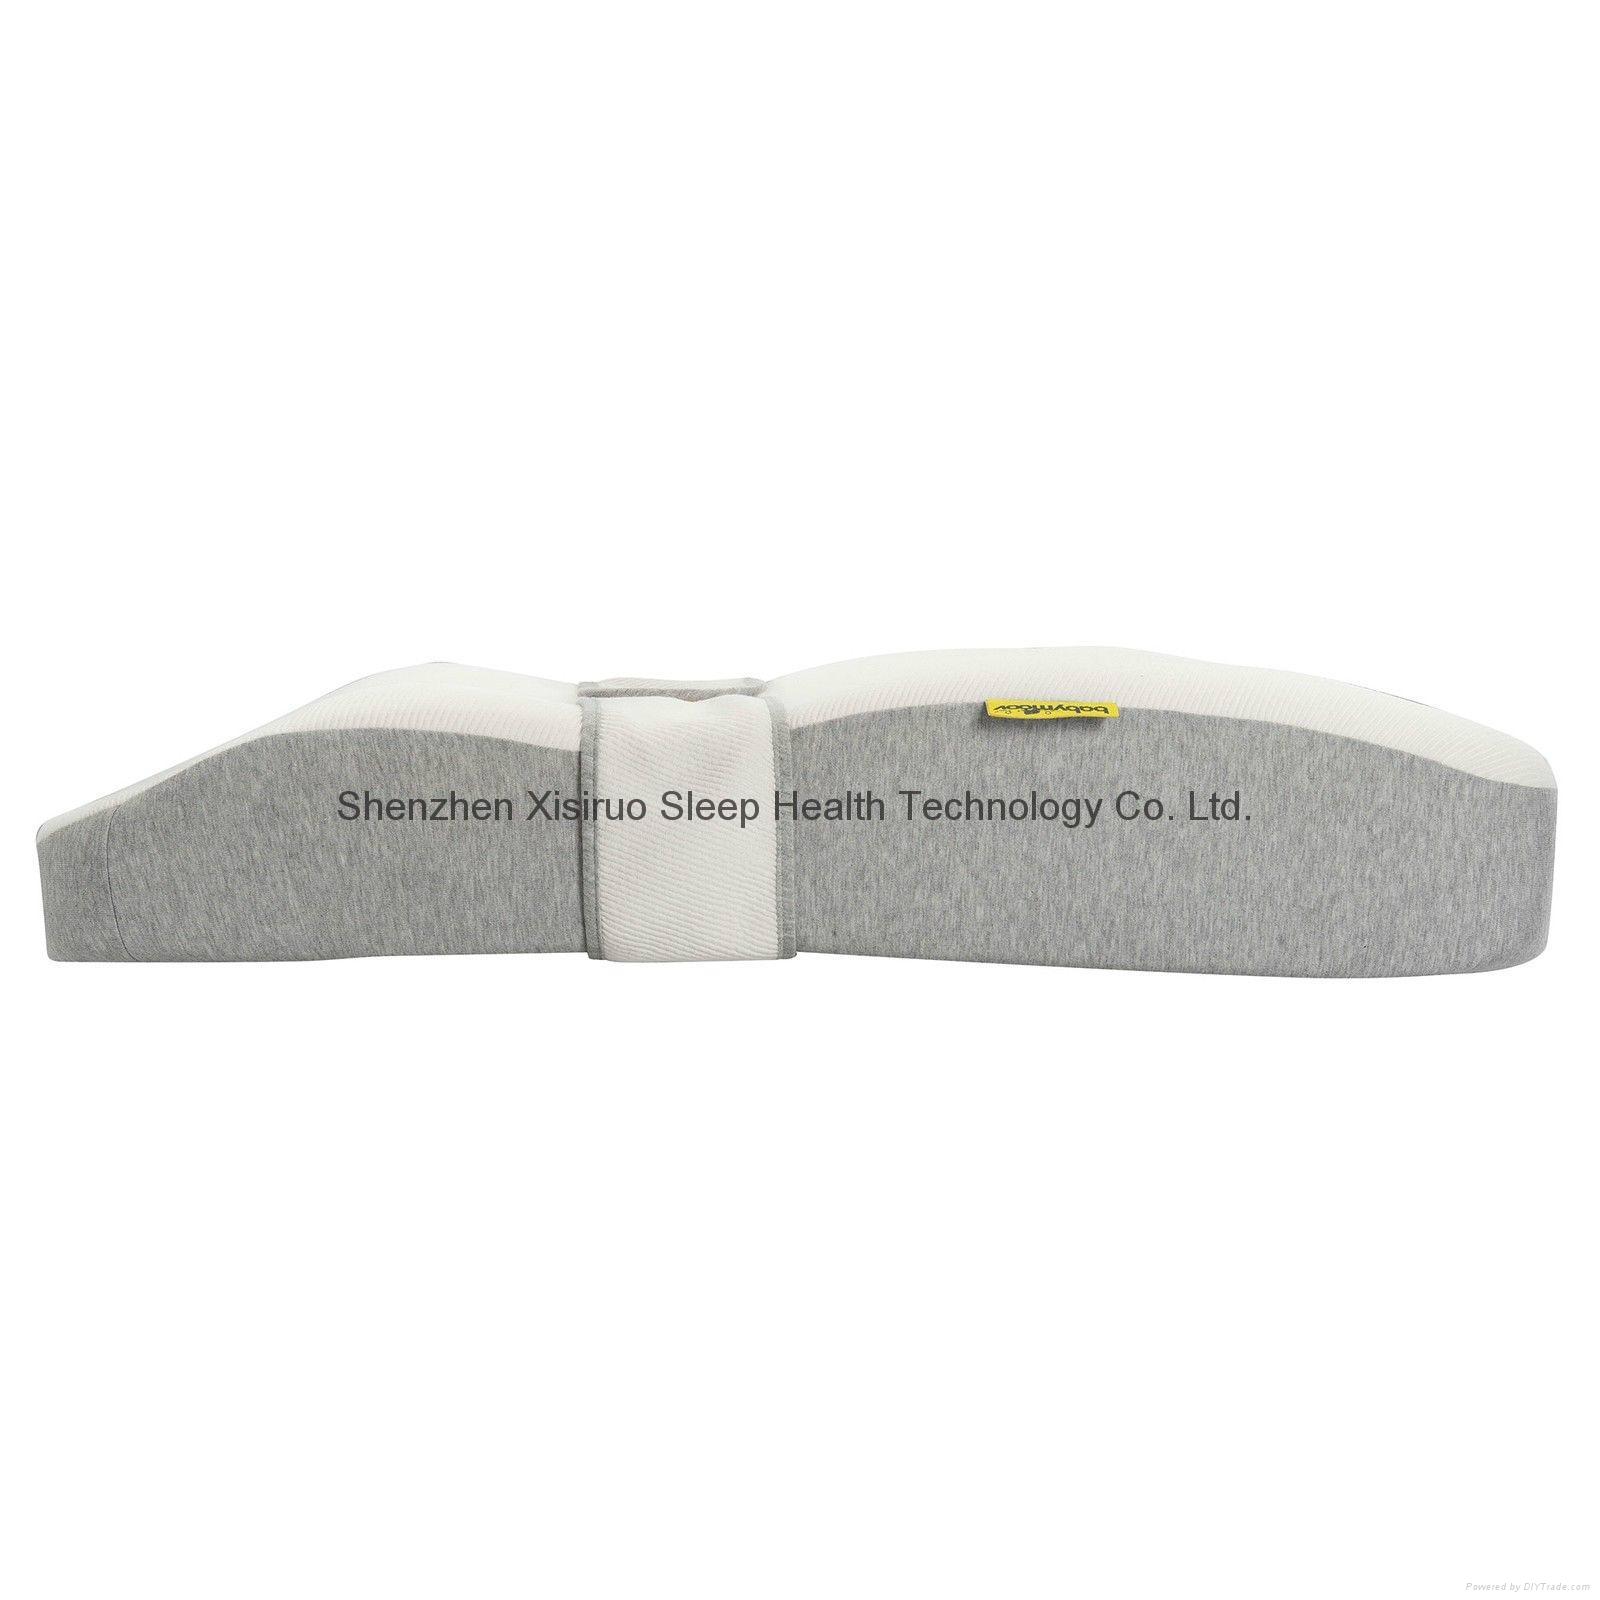 BabyChild Support Washable Memory Foam Travel Mattress  1